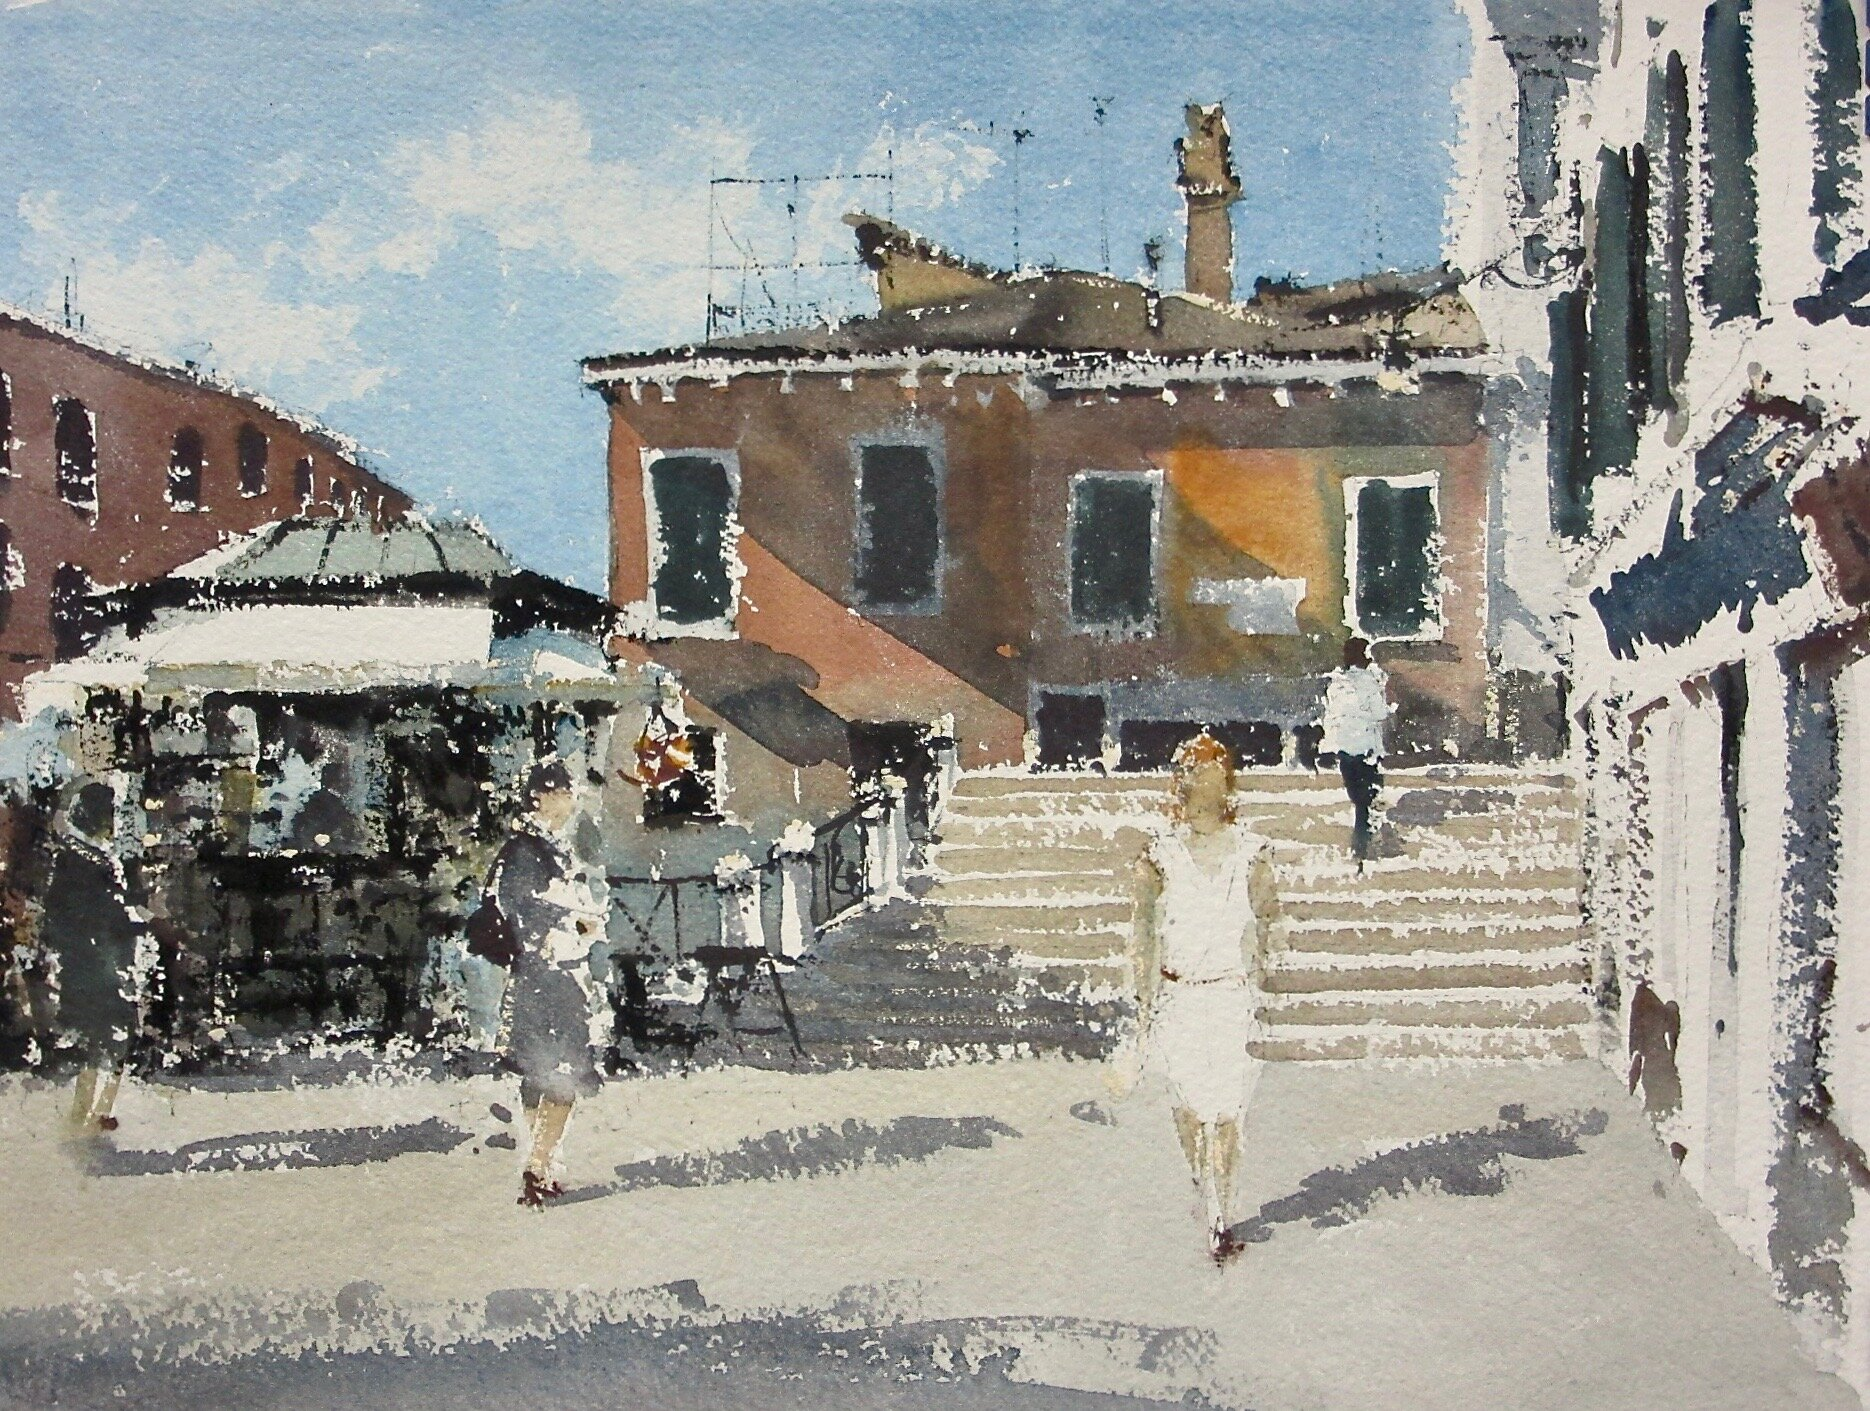 Campo San Pantalon Venice: 11 x 15.5 in: £750